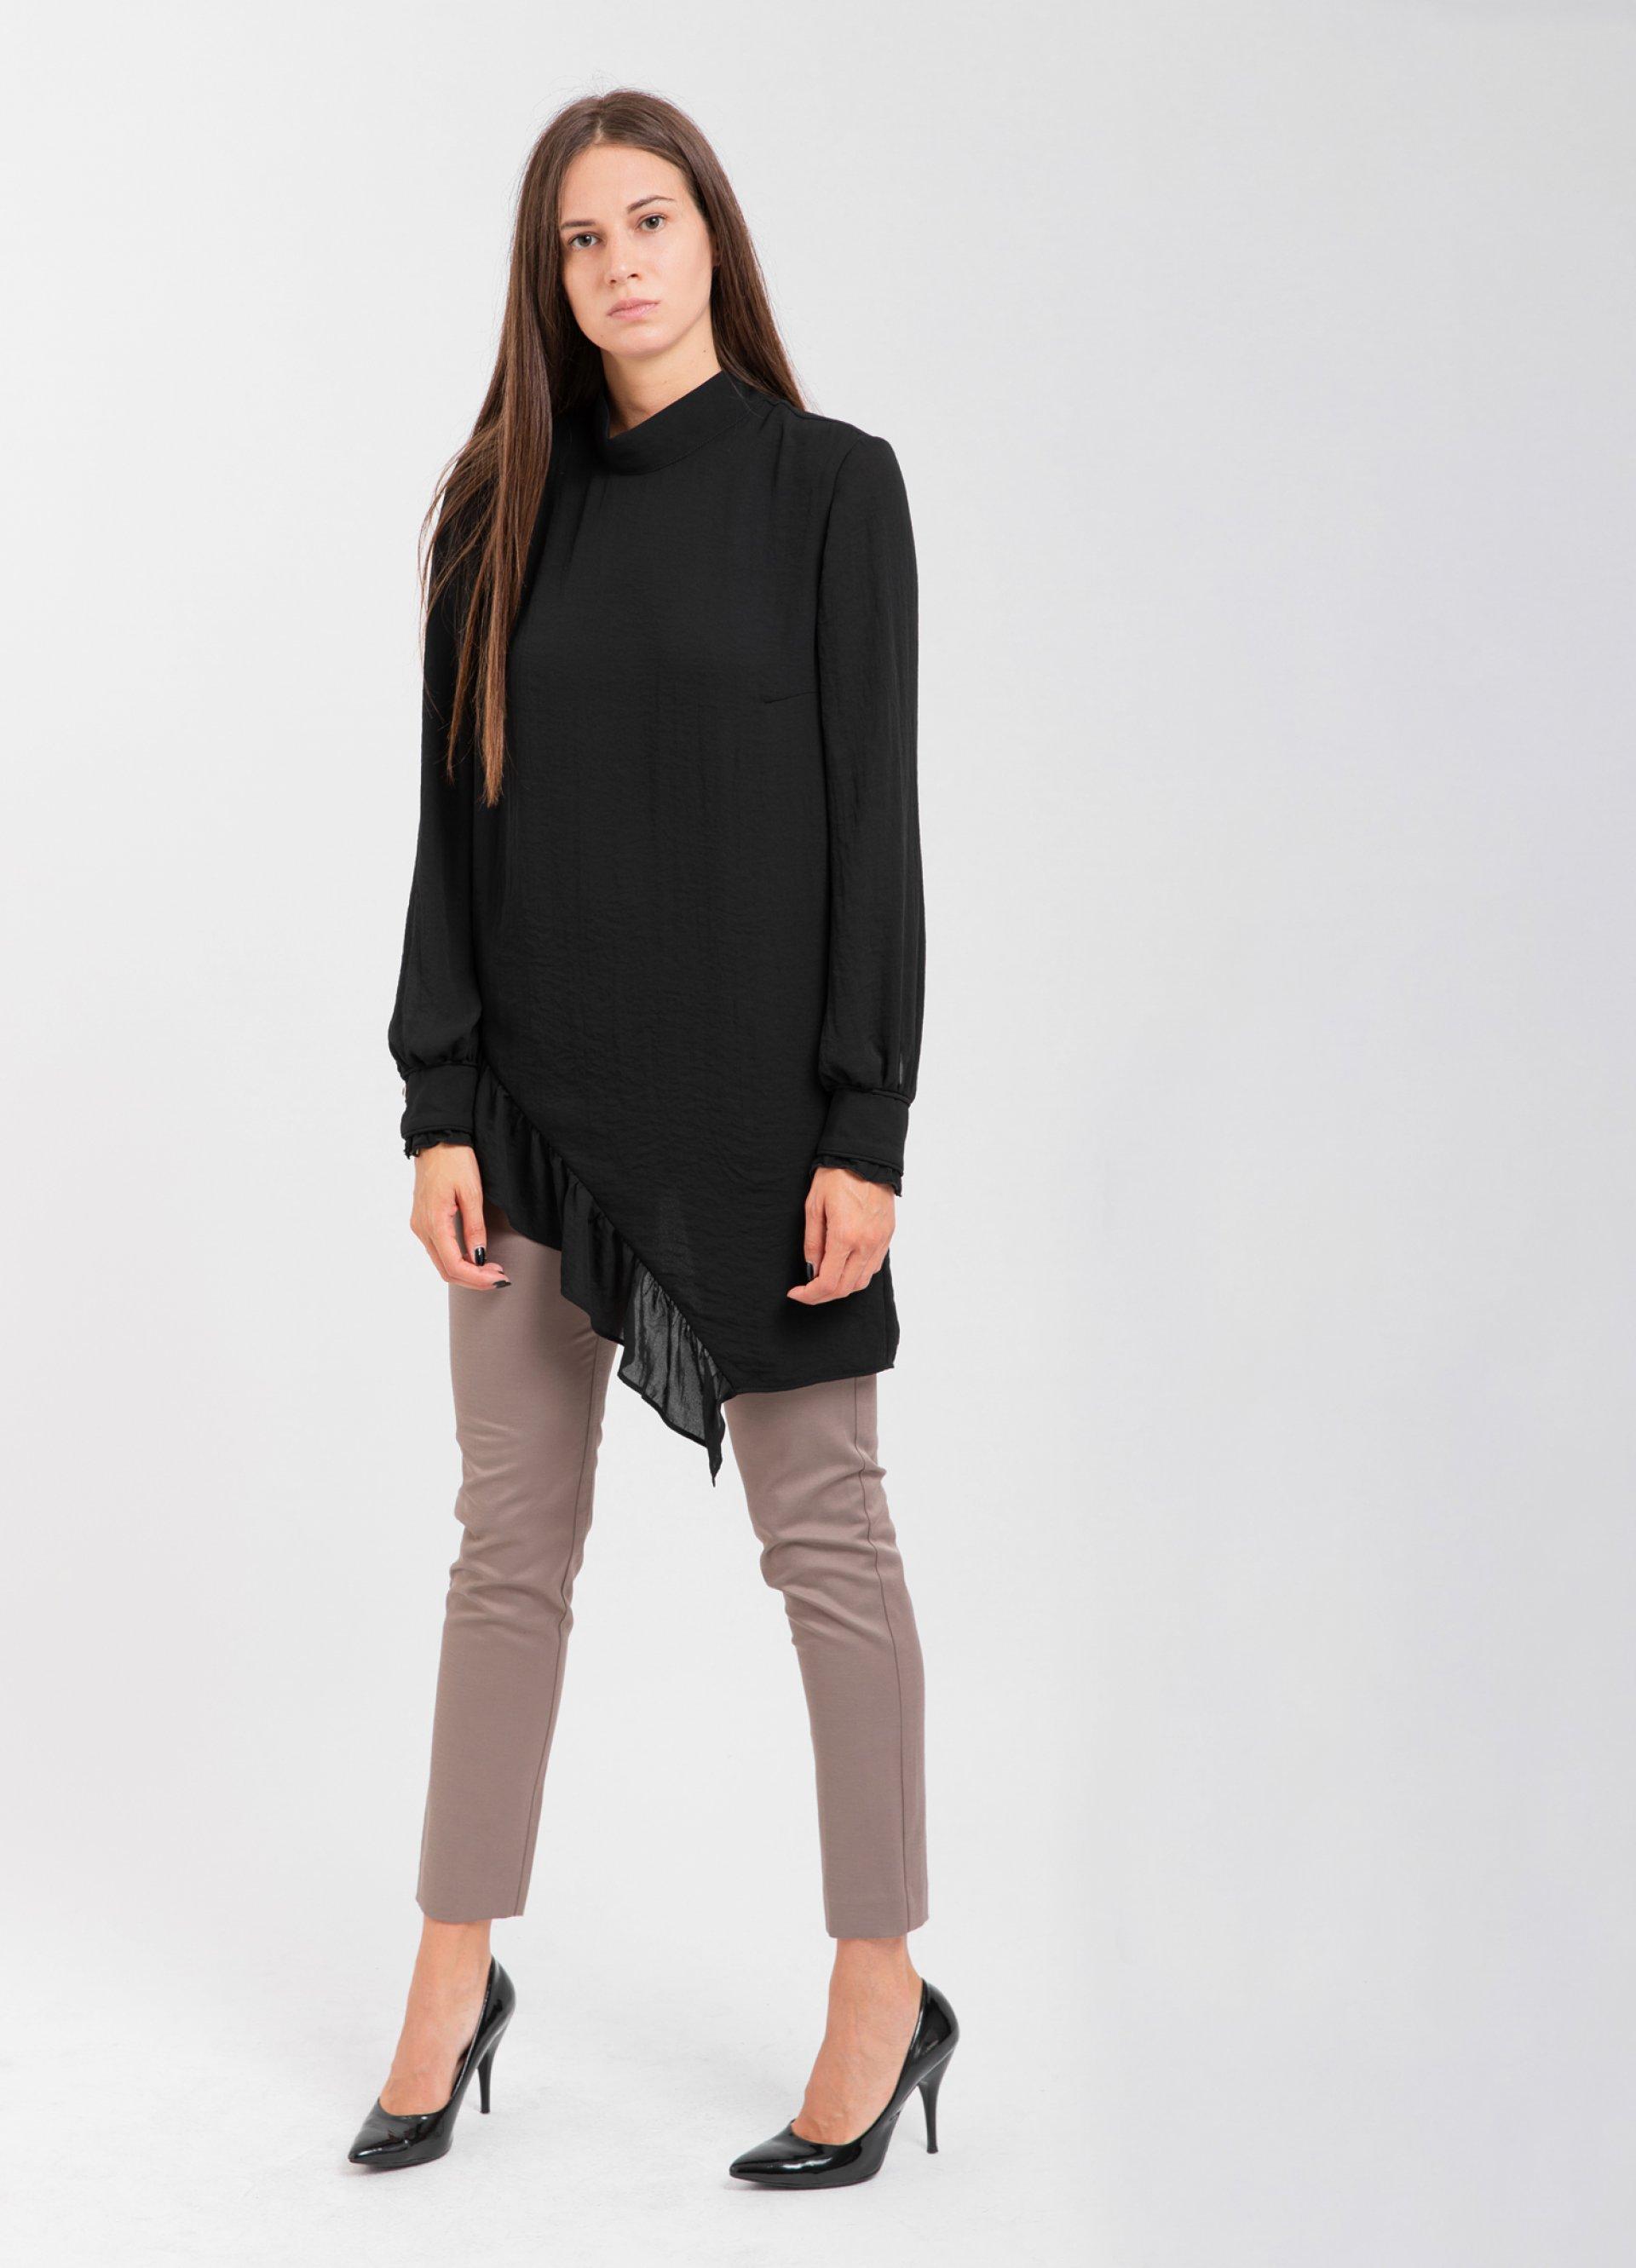 TUNIKA – PS Fashion, TUNIKA